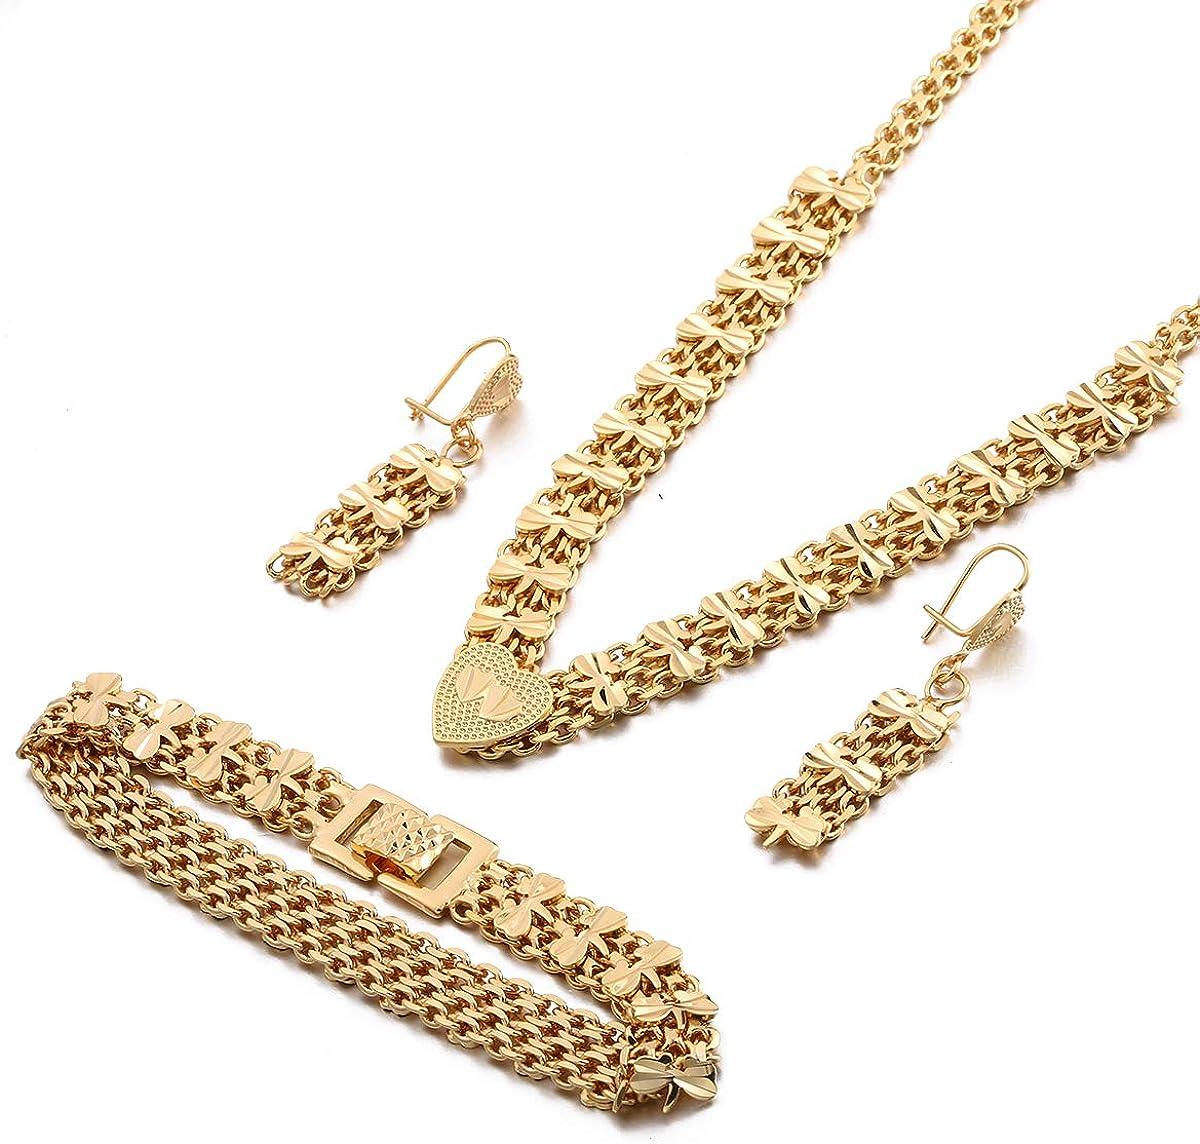 Dubai Bracelet Necklace Earring Double Heart Design Gold Jewelry Set